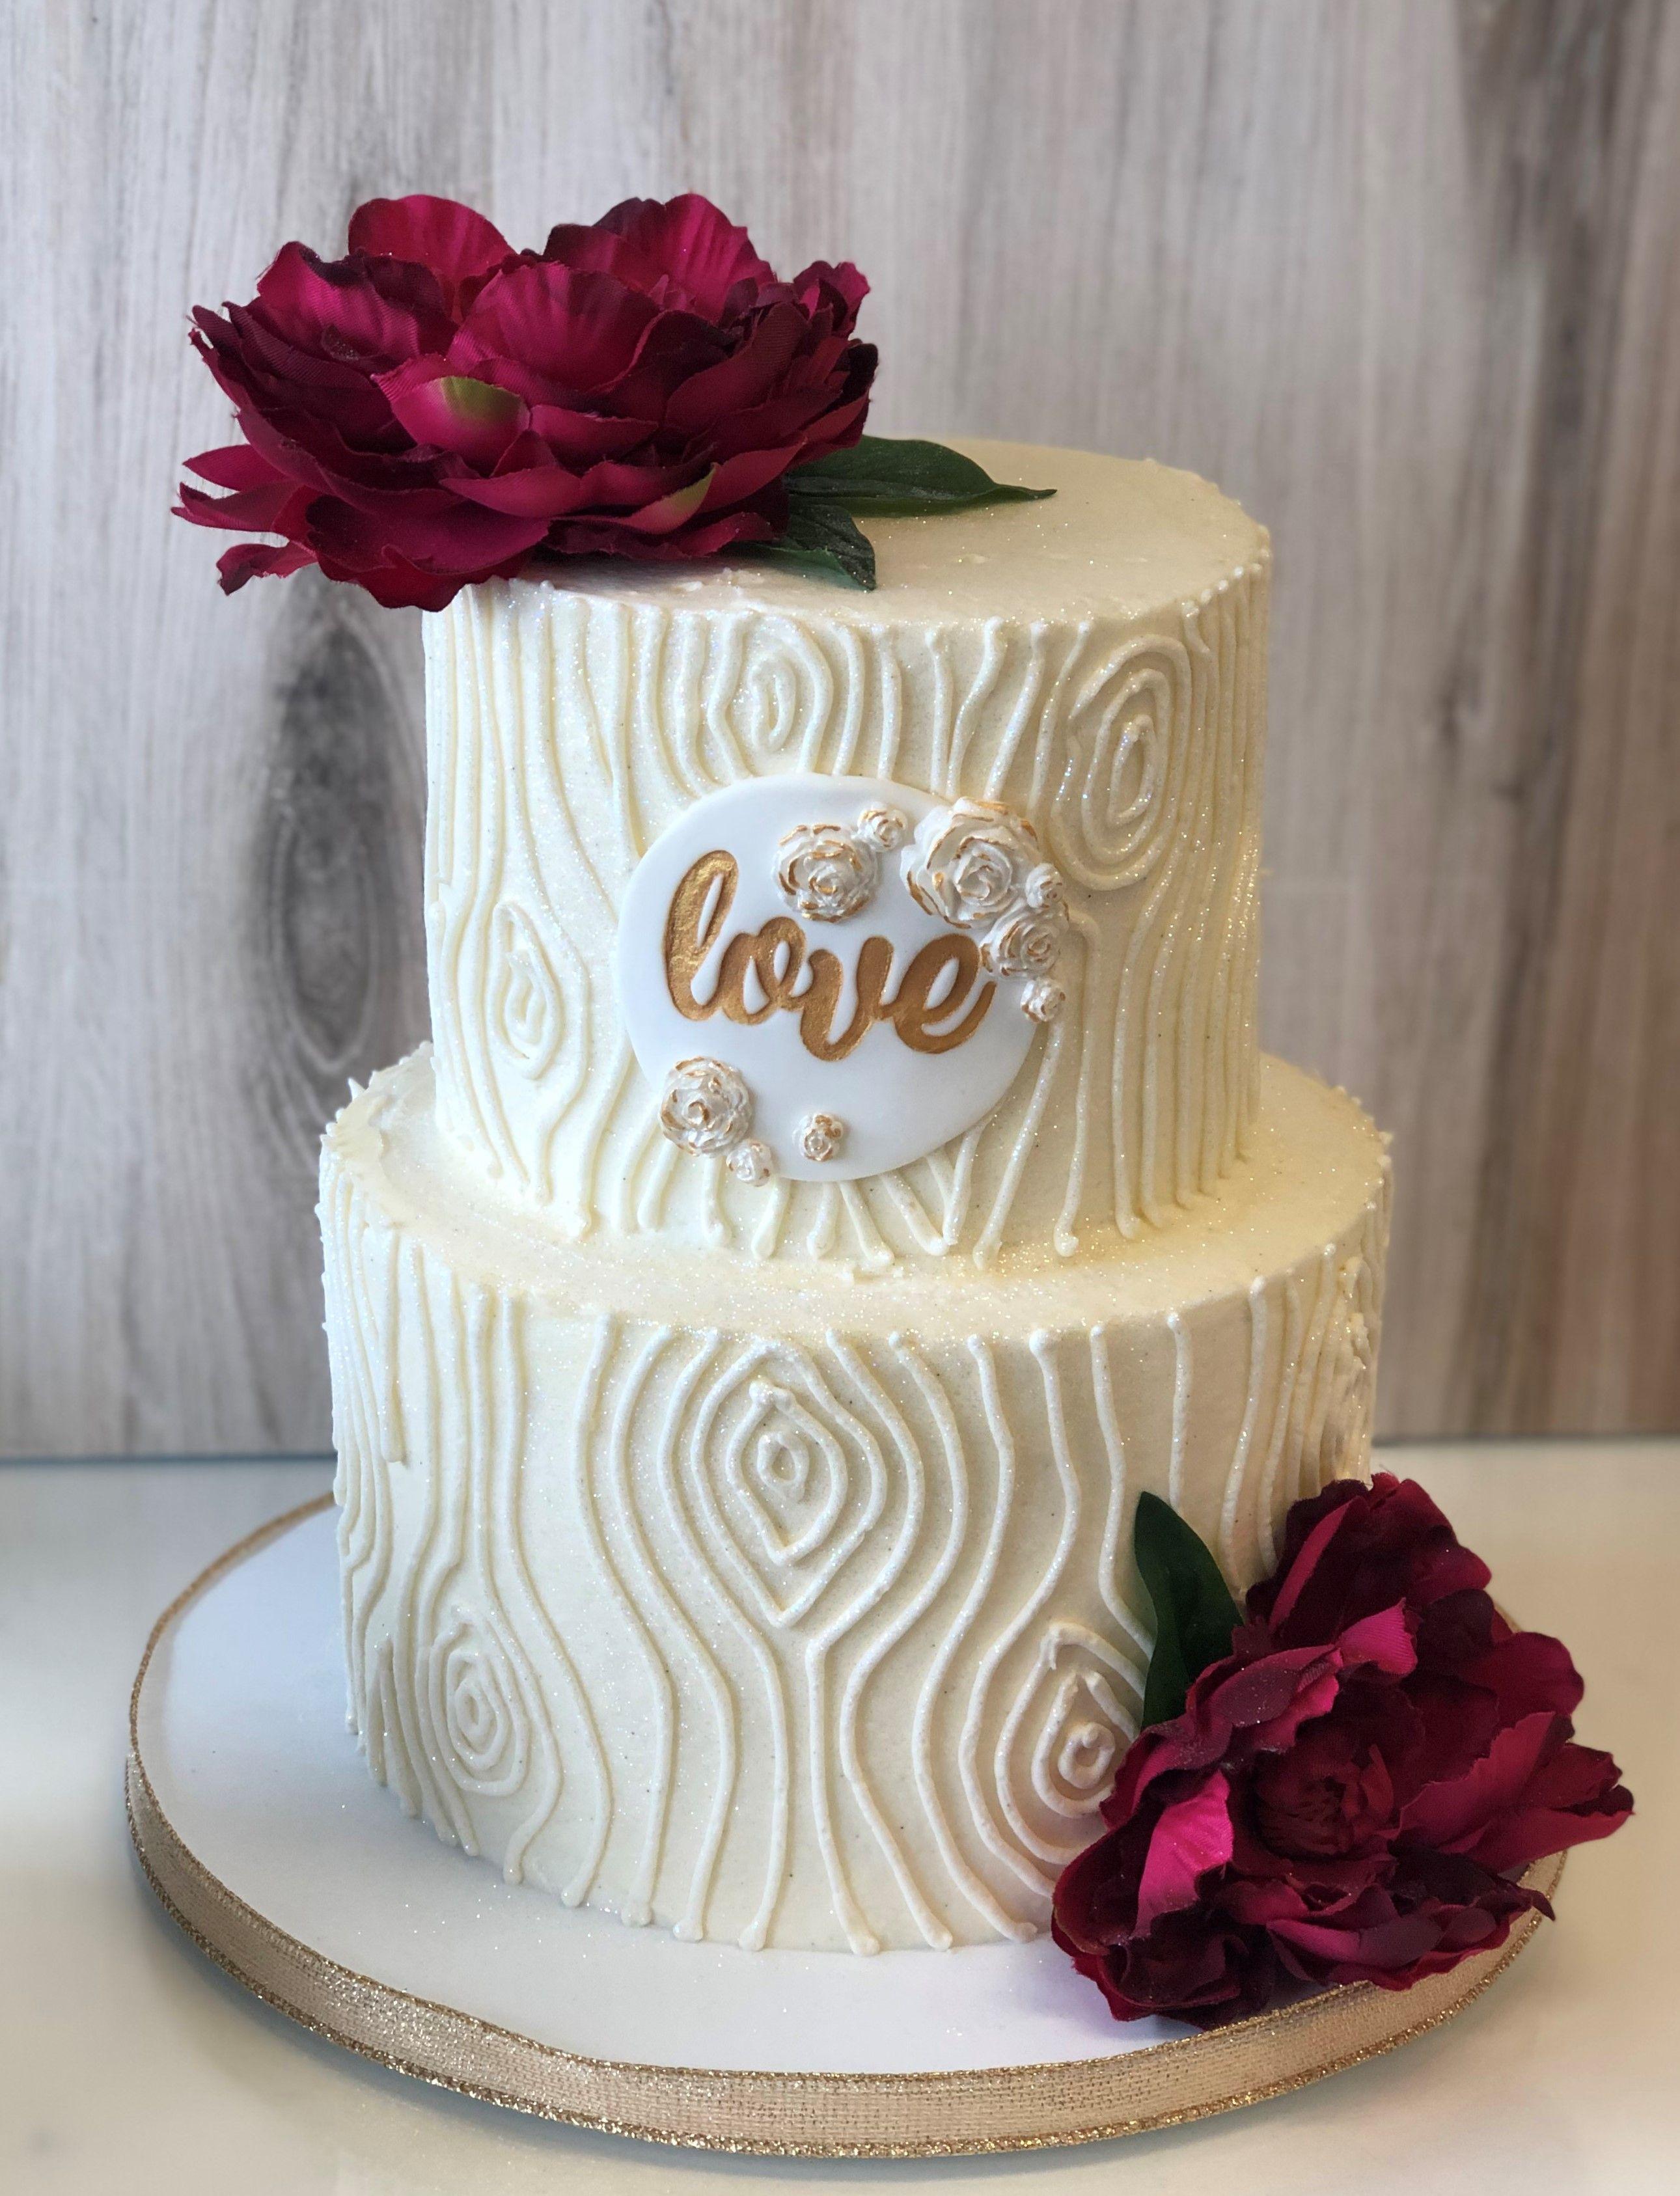 Custom Cakes Fondant Cake Designs Flower Cake Tiered Cakes